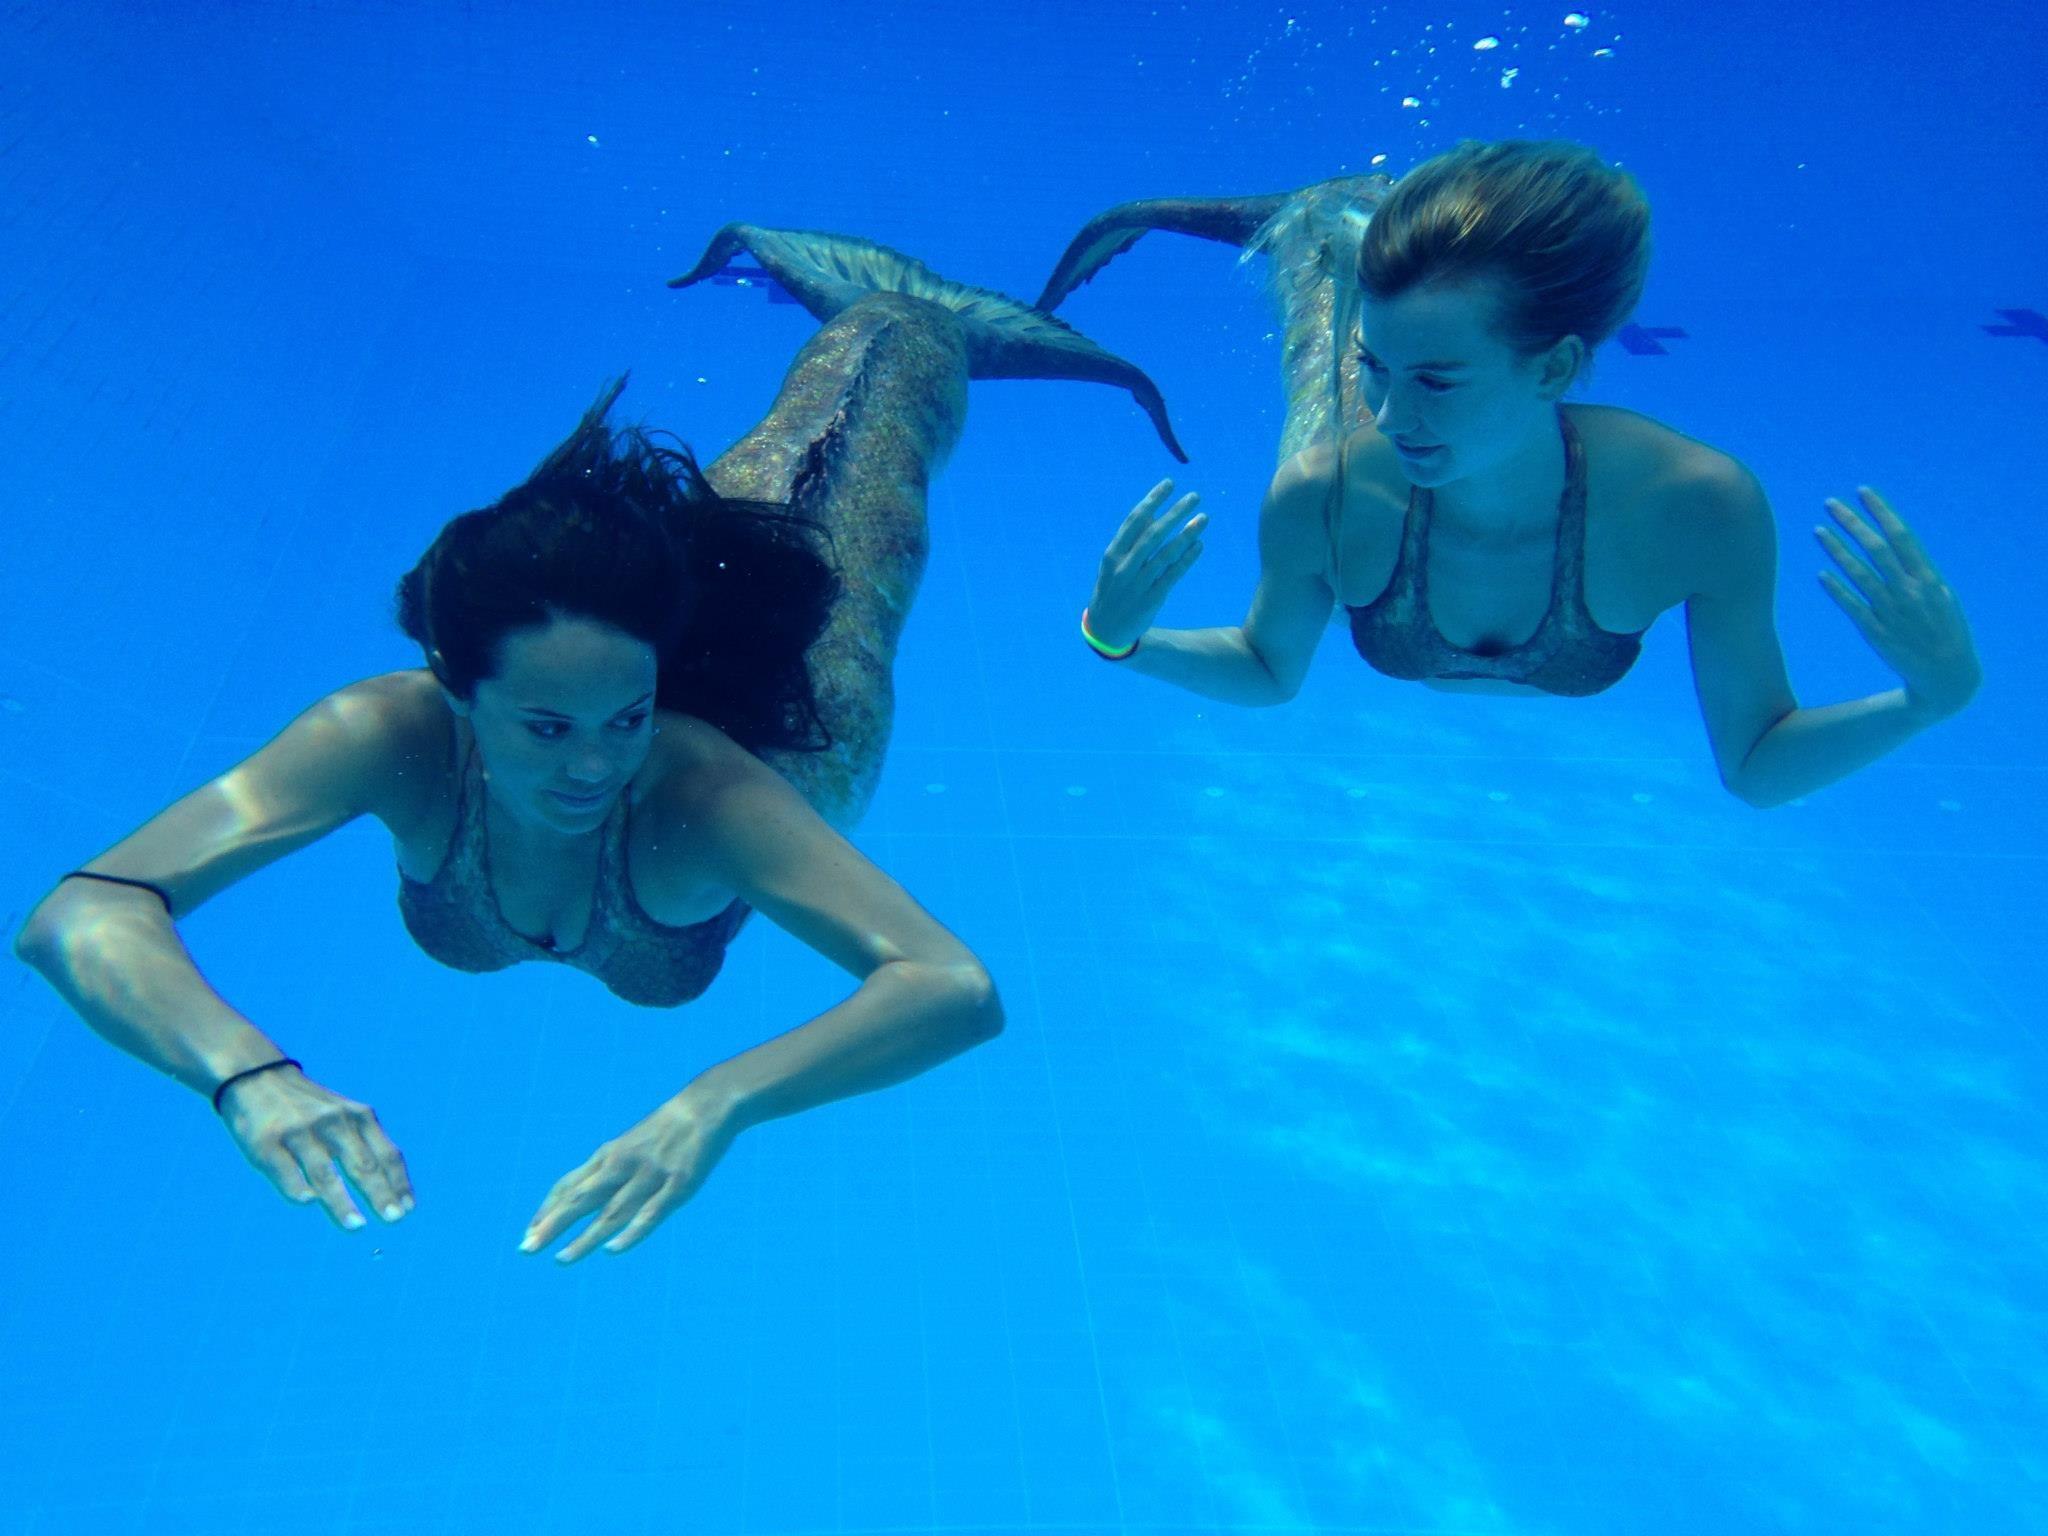 Mako mermaids behind the scenes of season 3 mako mermaids island of secrets pinterest - Image de sirene h2o ...